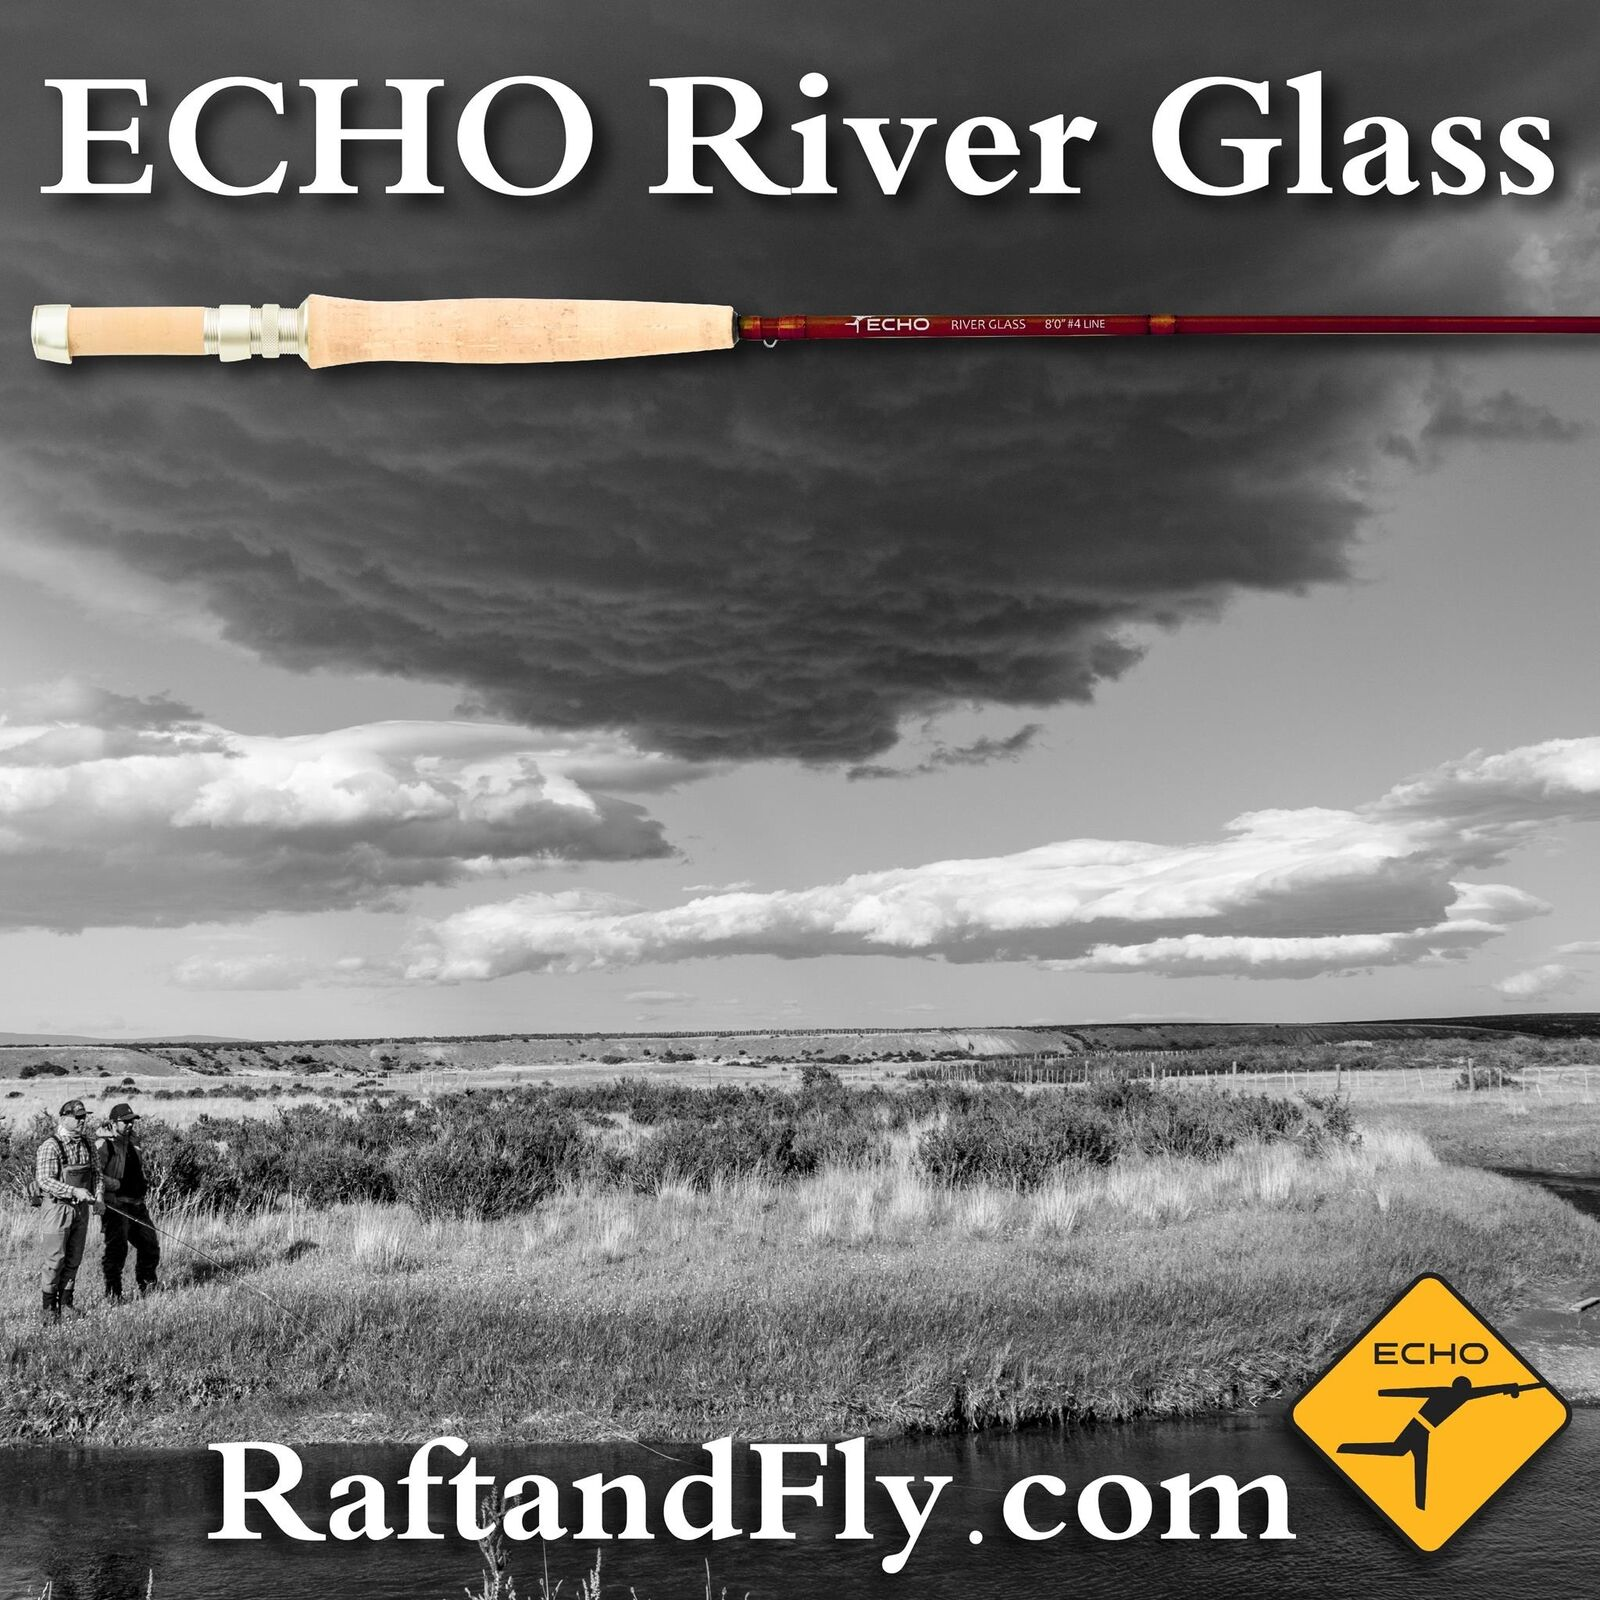 Caramelo de Color ámbar de vidrio Río Echo 4wt 8' 0  - Garantía De Por Vida-Envío Gratis